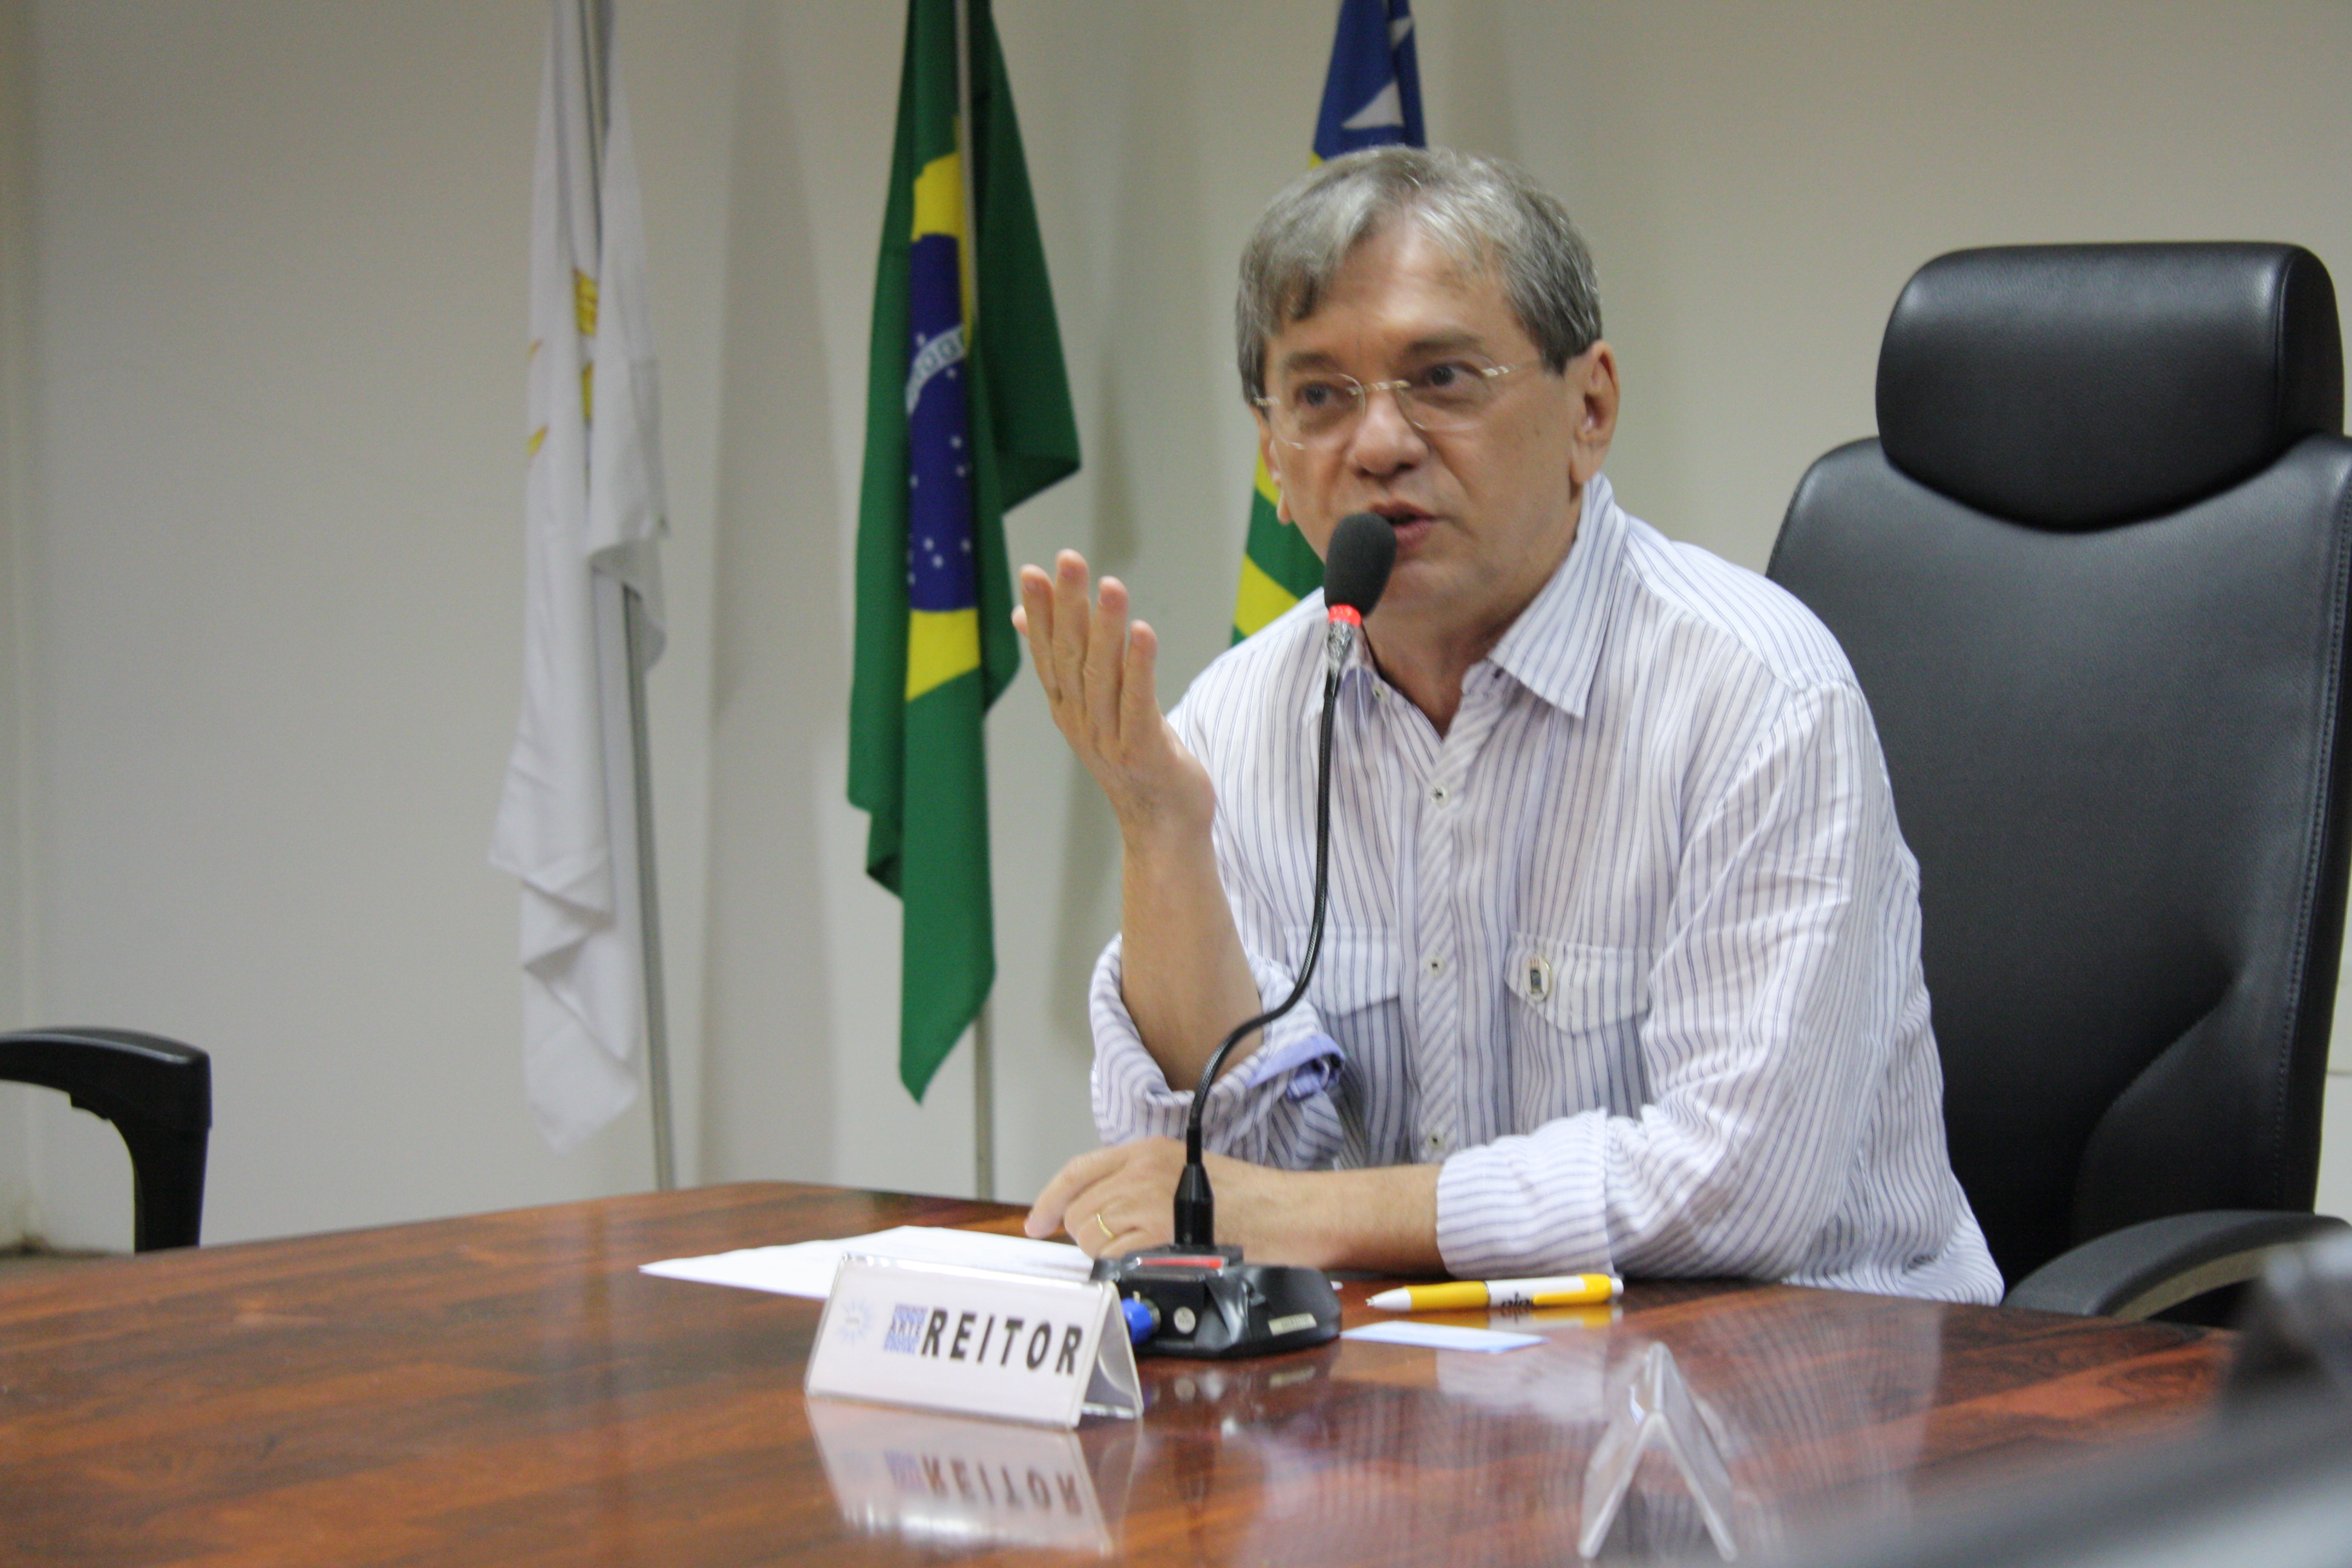 Universidade Federal do Piauí abre 31 vagas para docentes